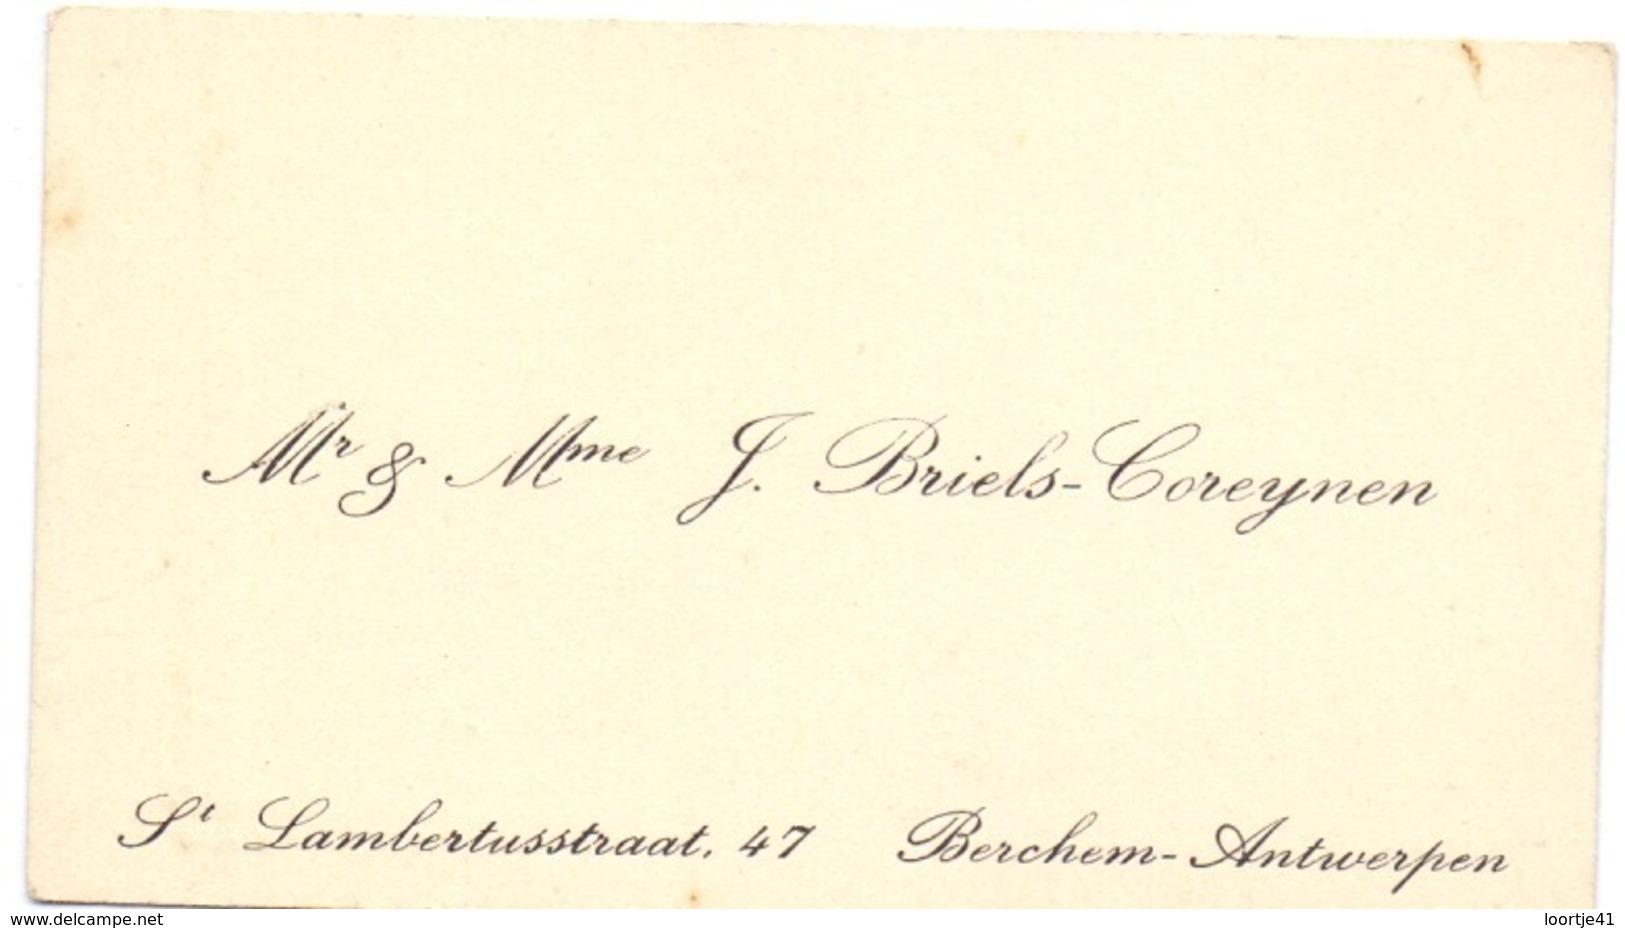 Visitekaartje - Carte Visite - Mr & Mme J. Briels - Coreynen - Berchem Antwerpen - Cartoncini Da Visita